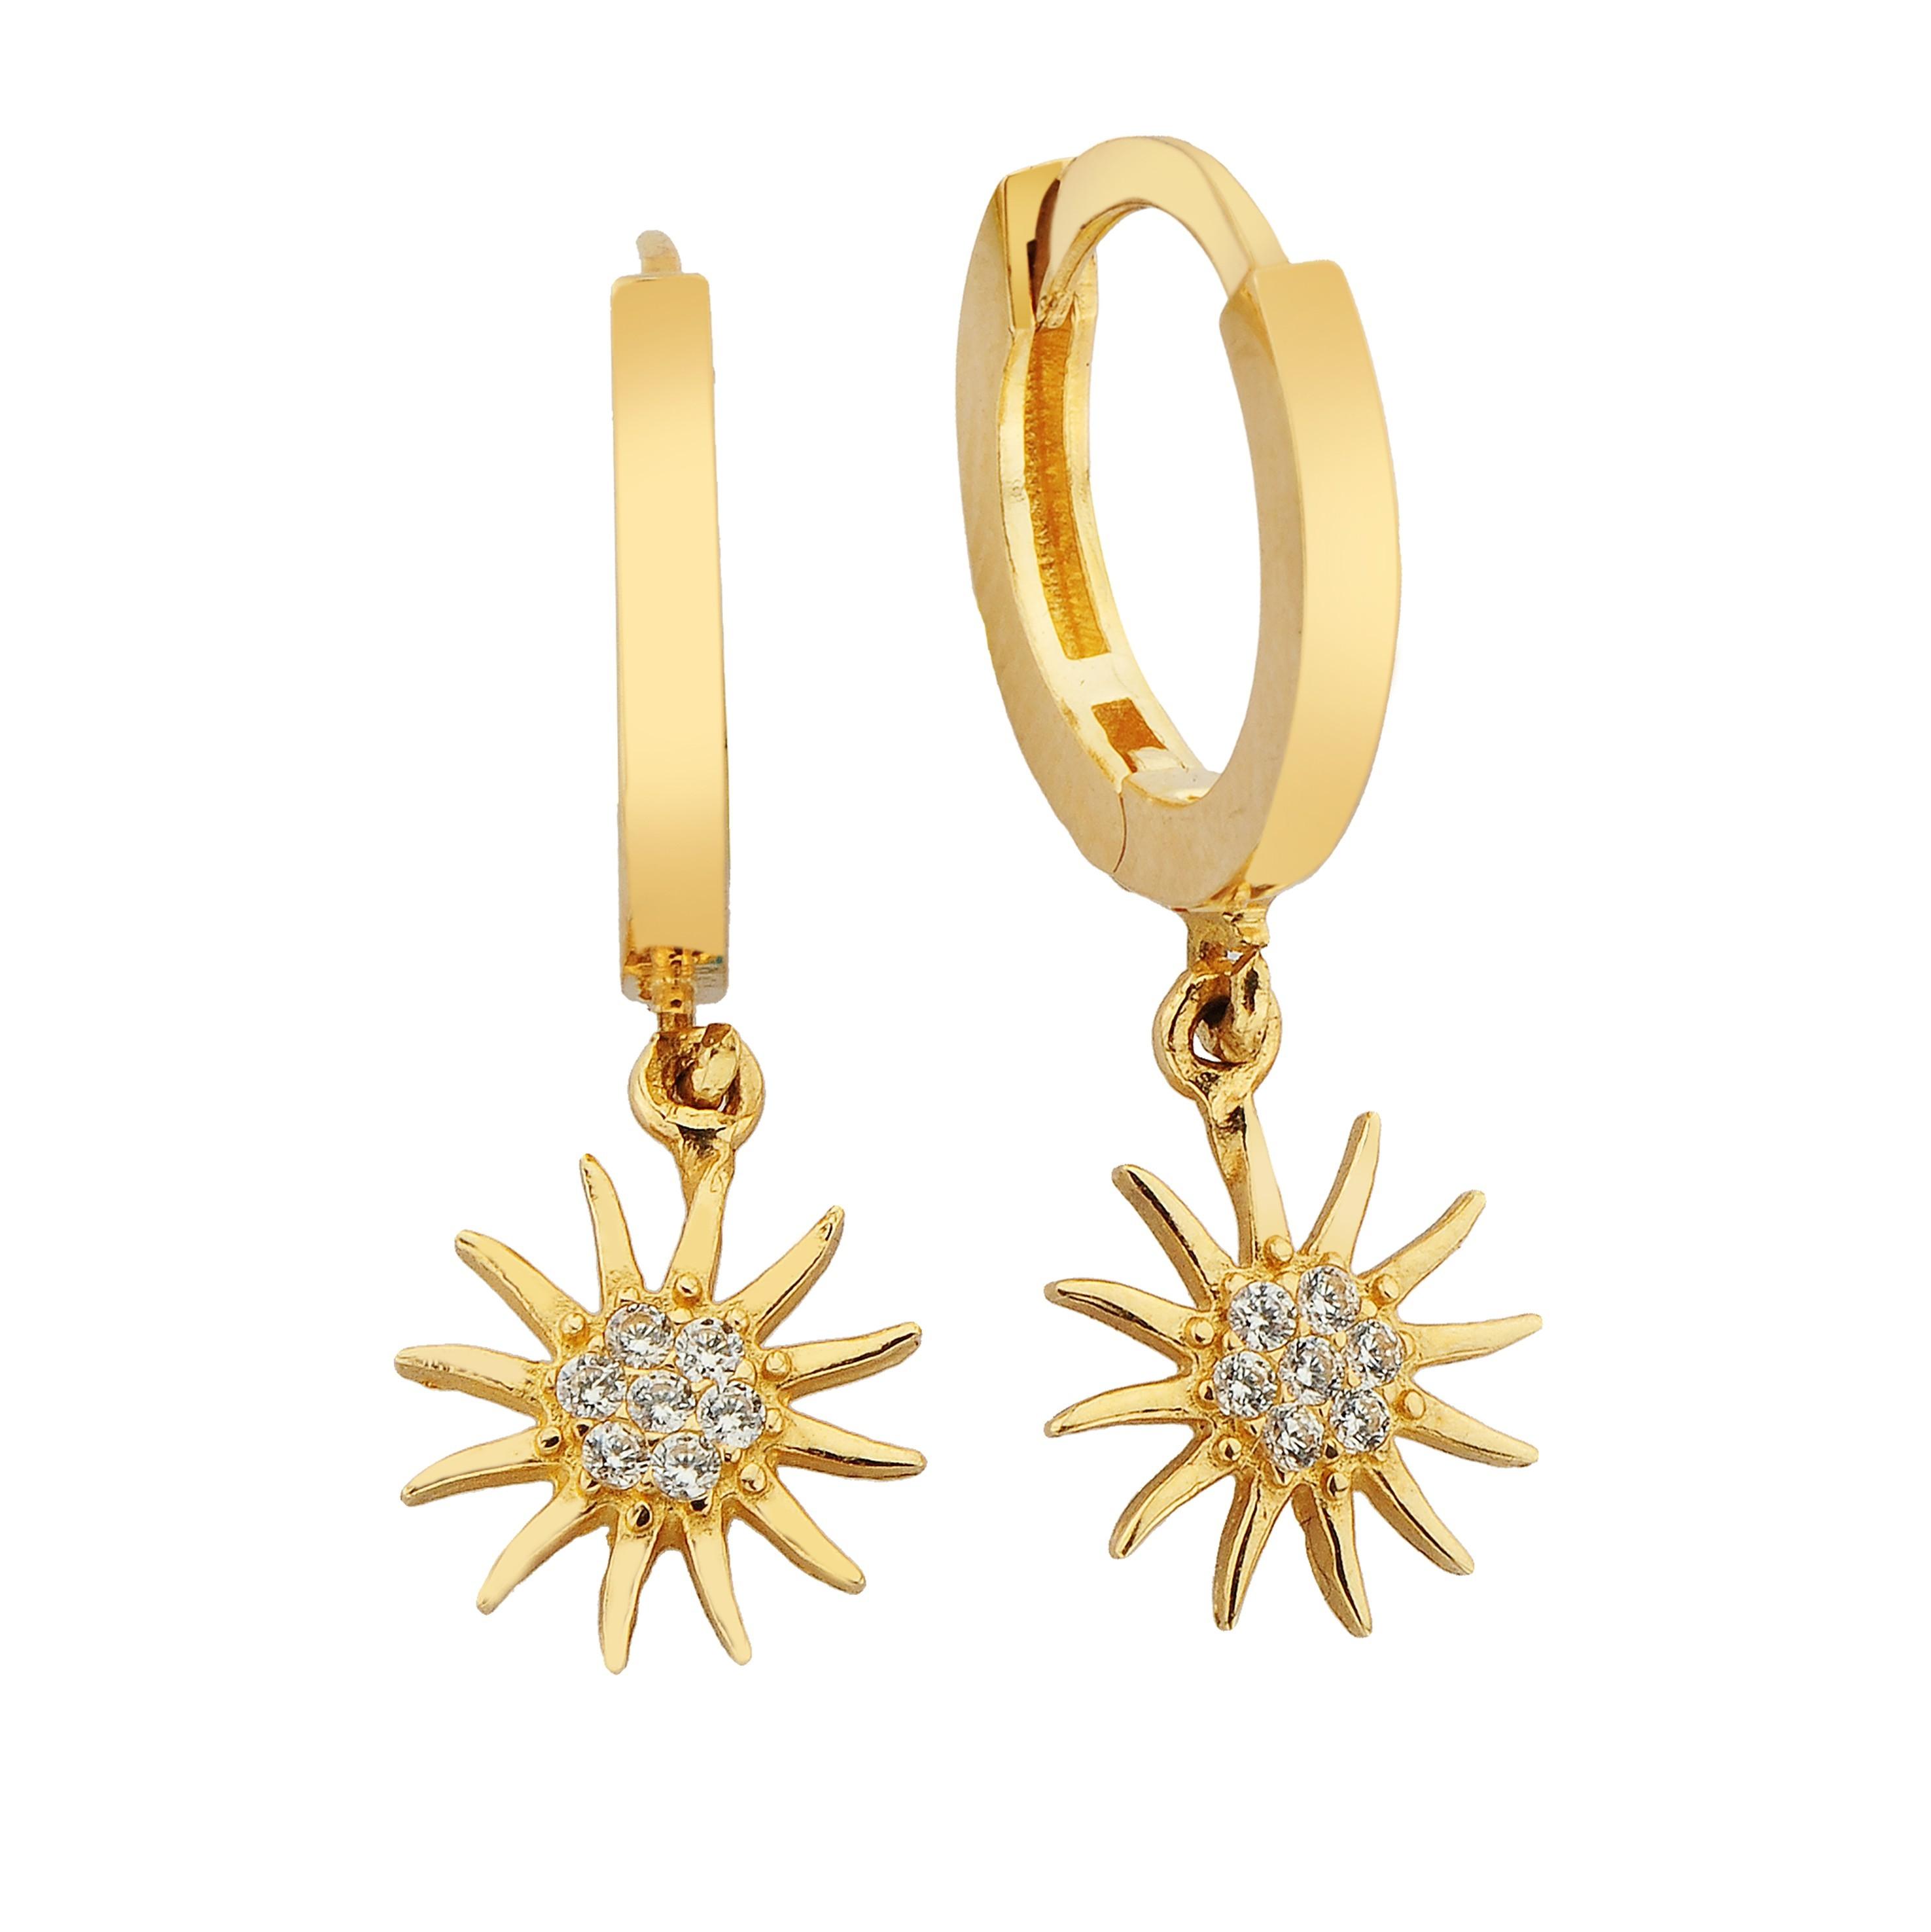 14K Real Solid Gold Sun Dangle Hoops Earrings for Women Christmas xmas handmade jewelry moon gift mother girl zodiac